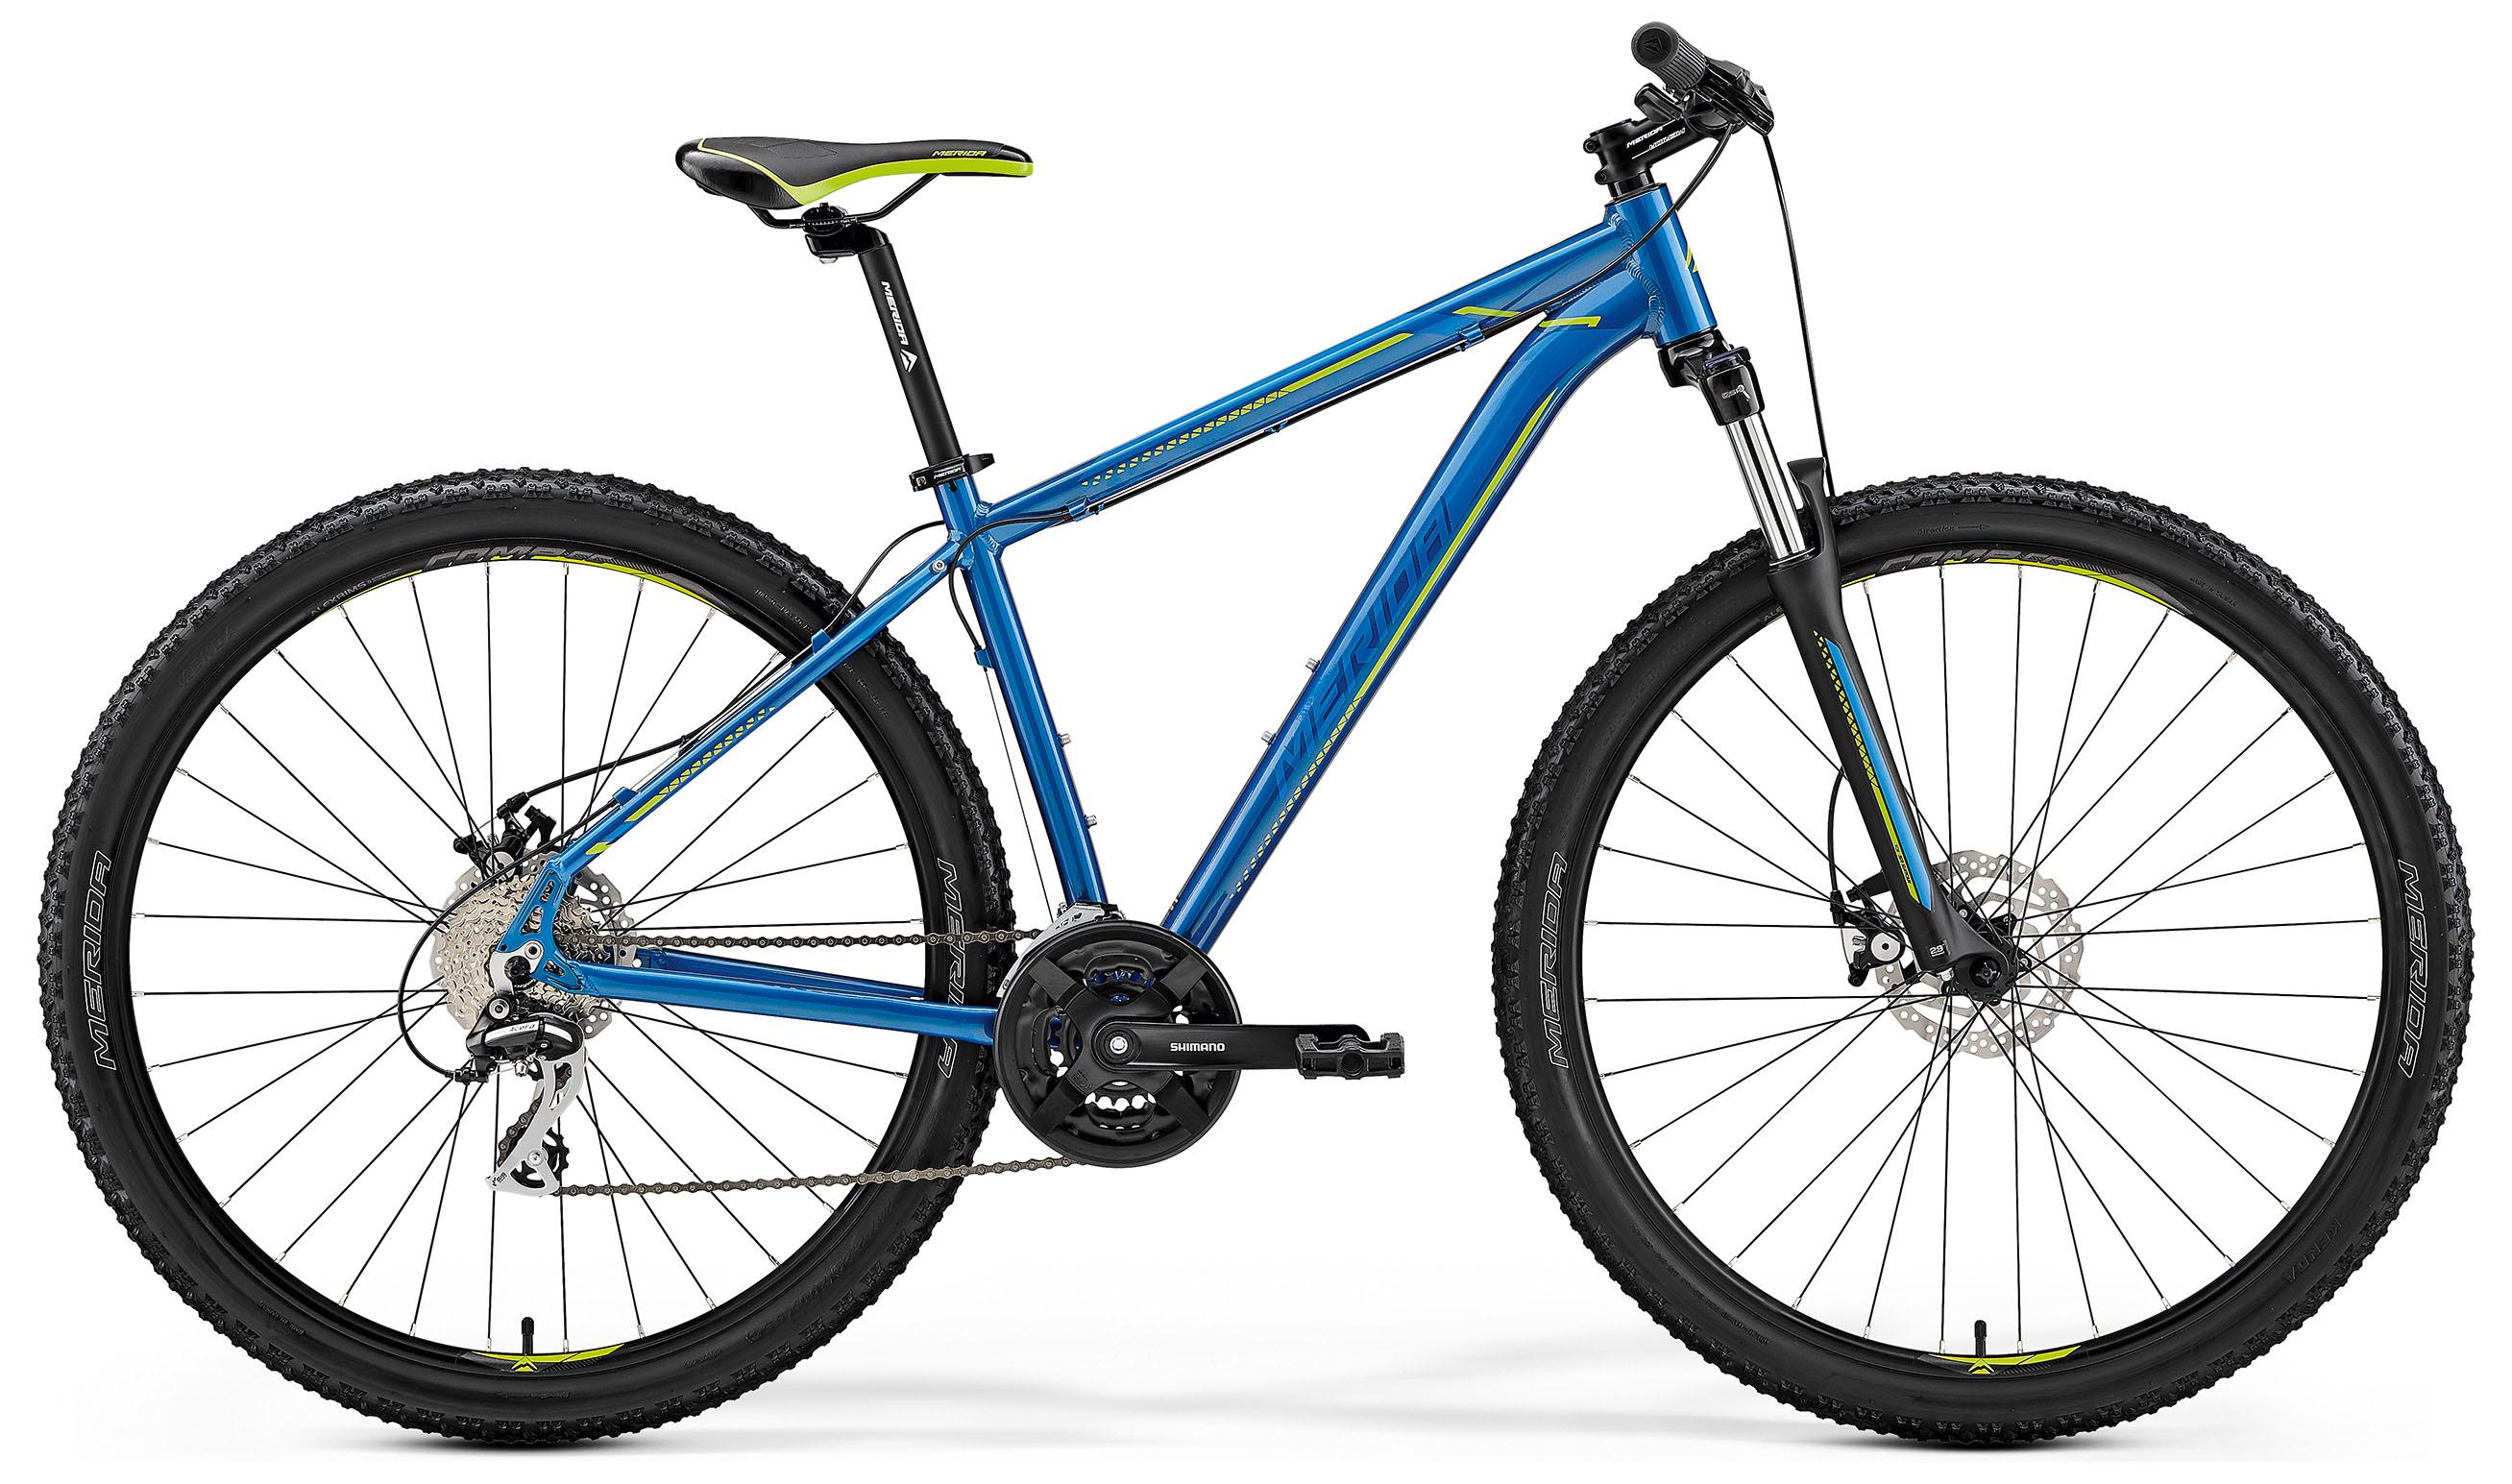 Велосипед Merida Big.Nine 20-MD 2019 велосипед merida scultura 4000 tw 2019